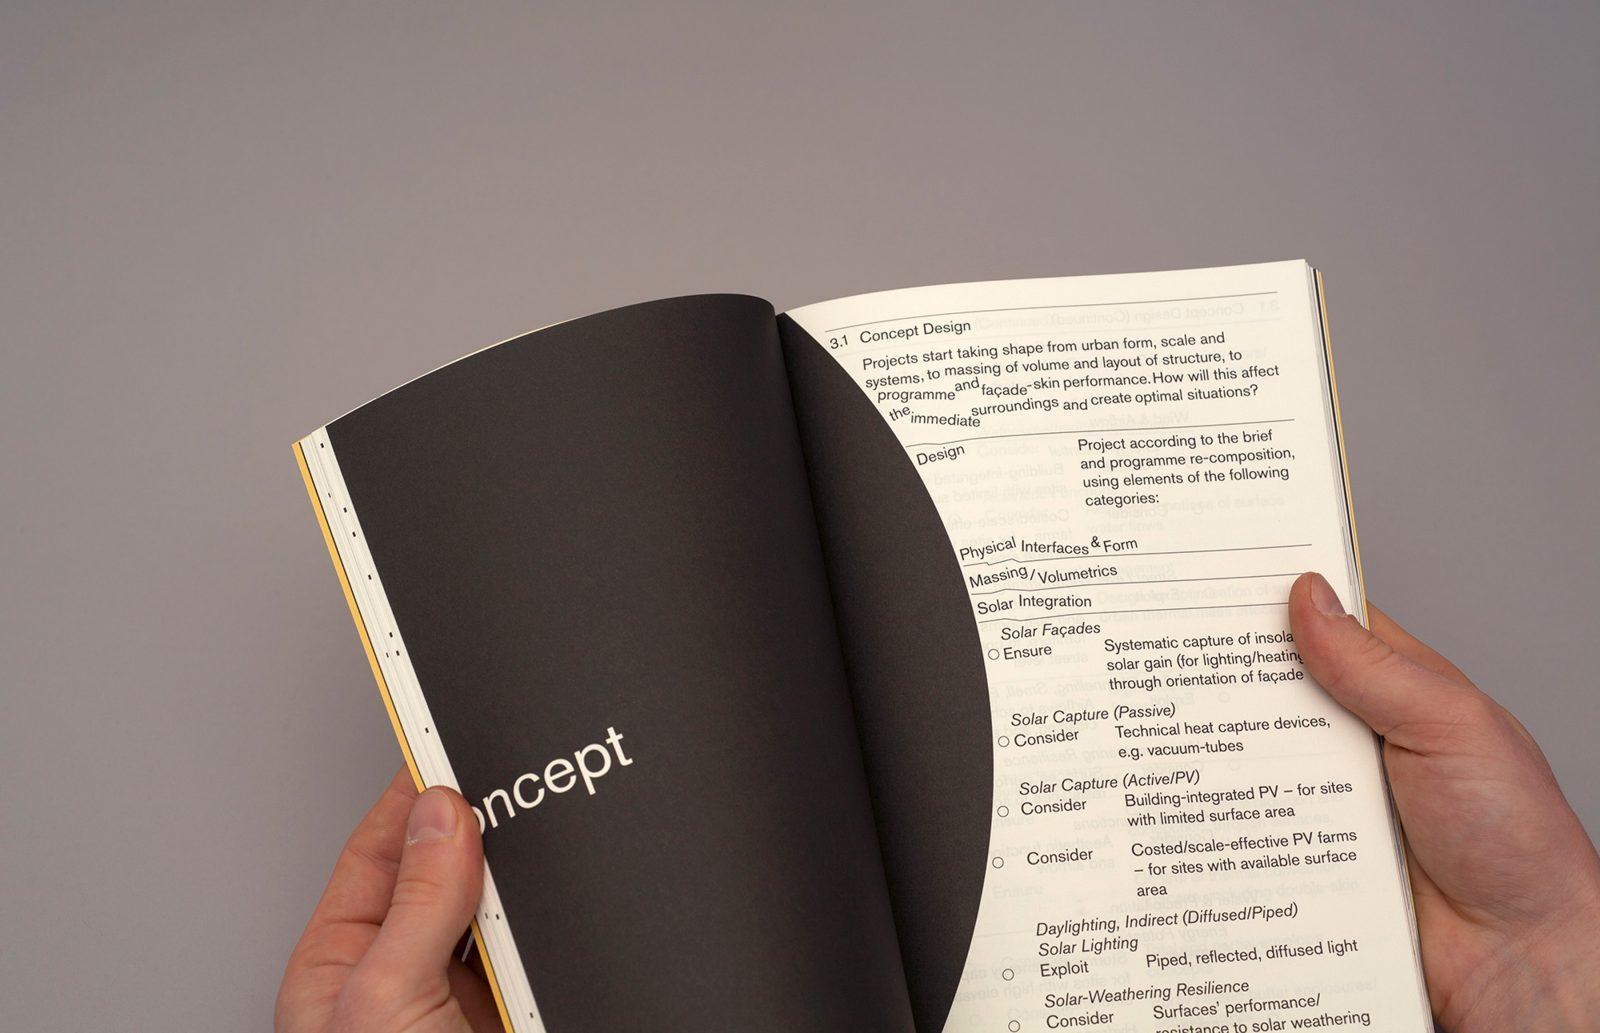 KjellanderSjoberg Workbook Process 3